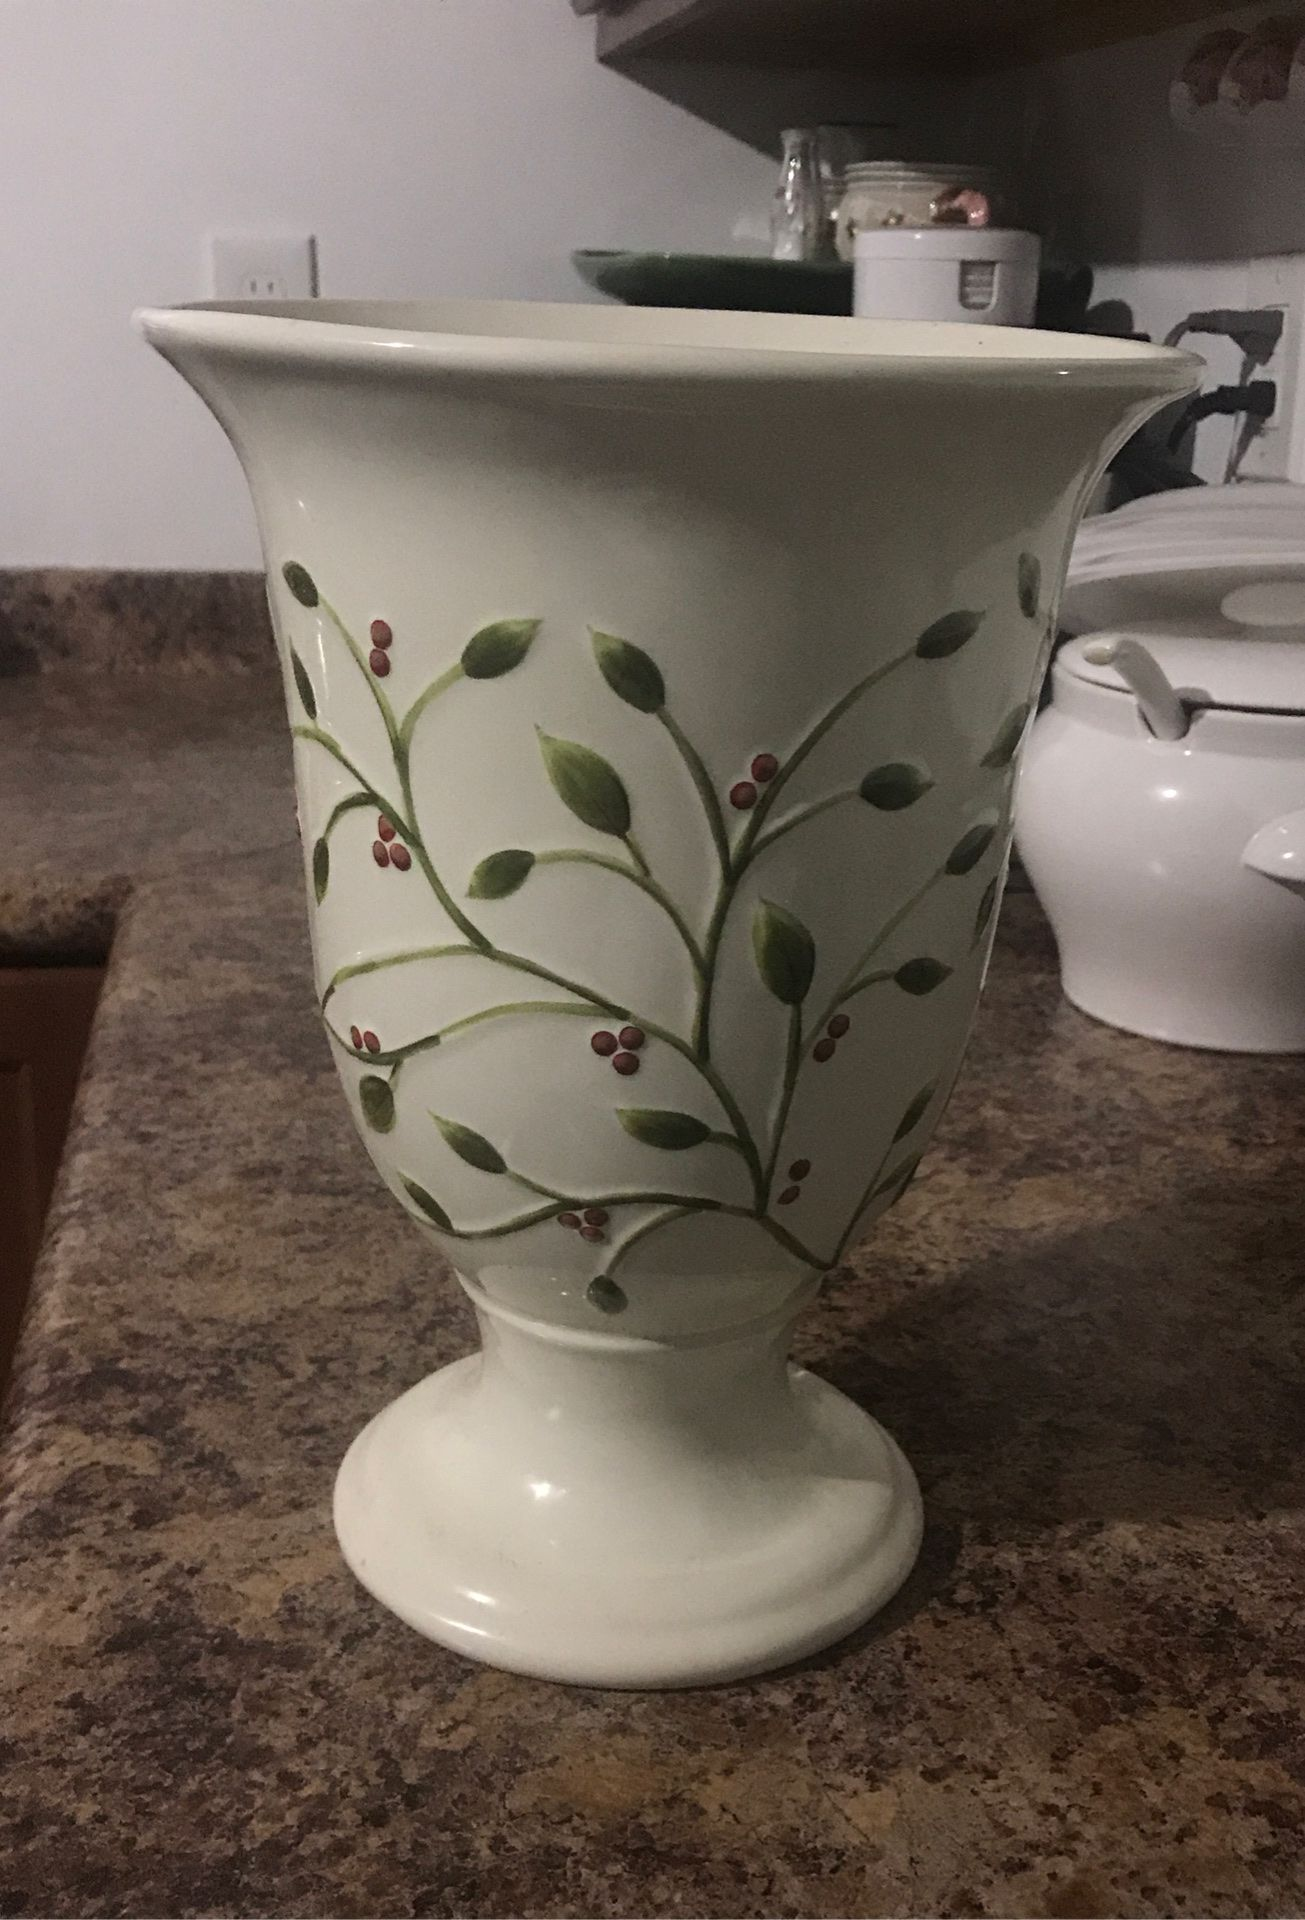 Nice decorative vase